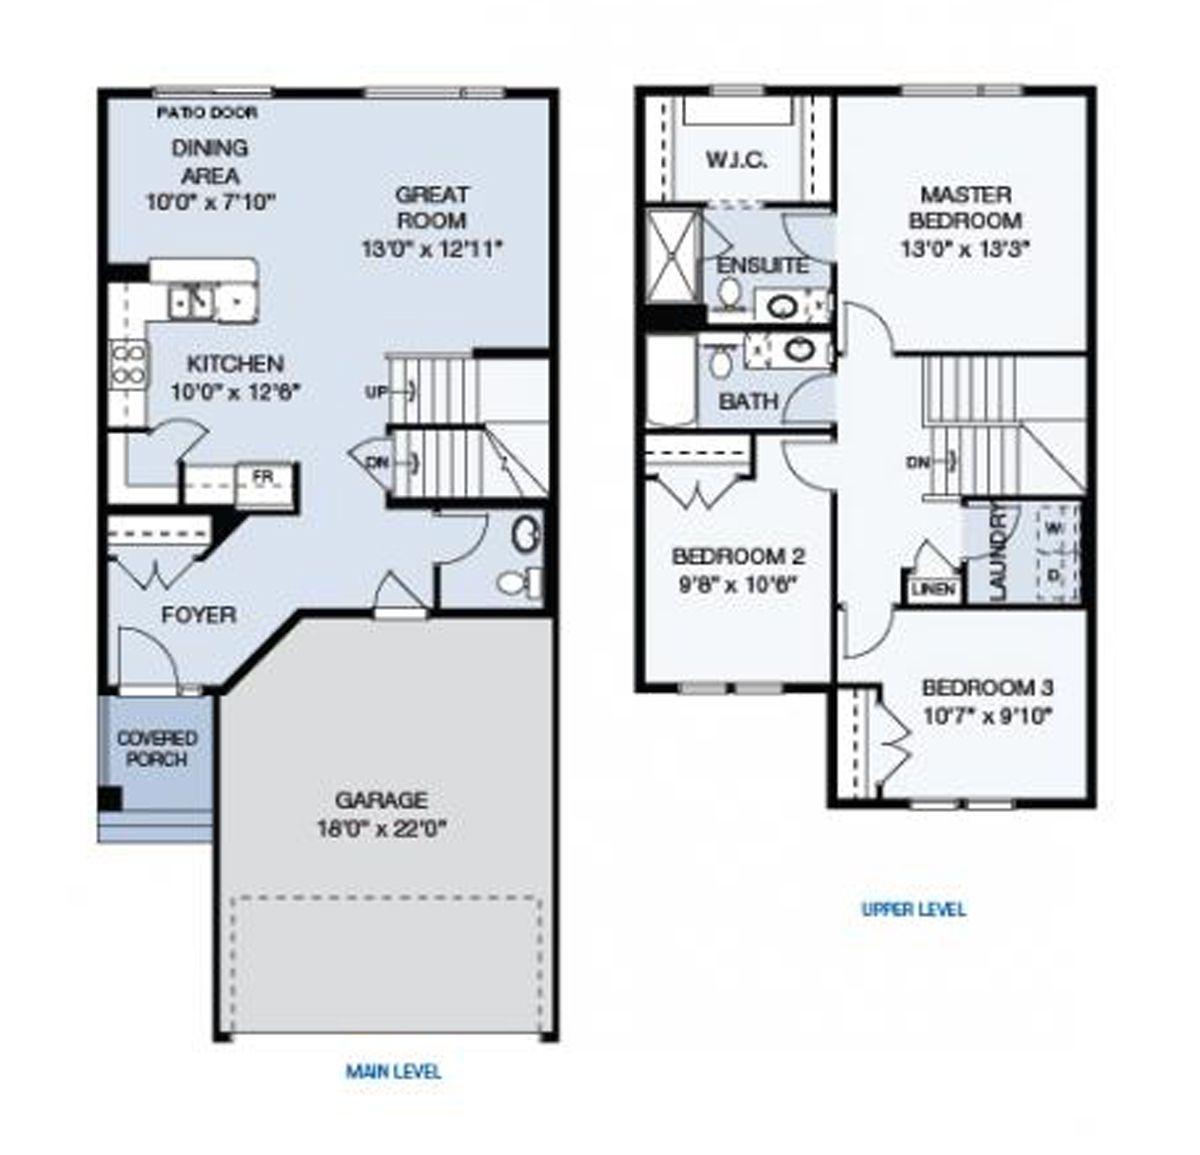 The Parkview Floor Plan.  1534 sq. ft. Main Floor: 694 sq. ft. Upper Floor: 840 sq. ft.